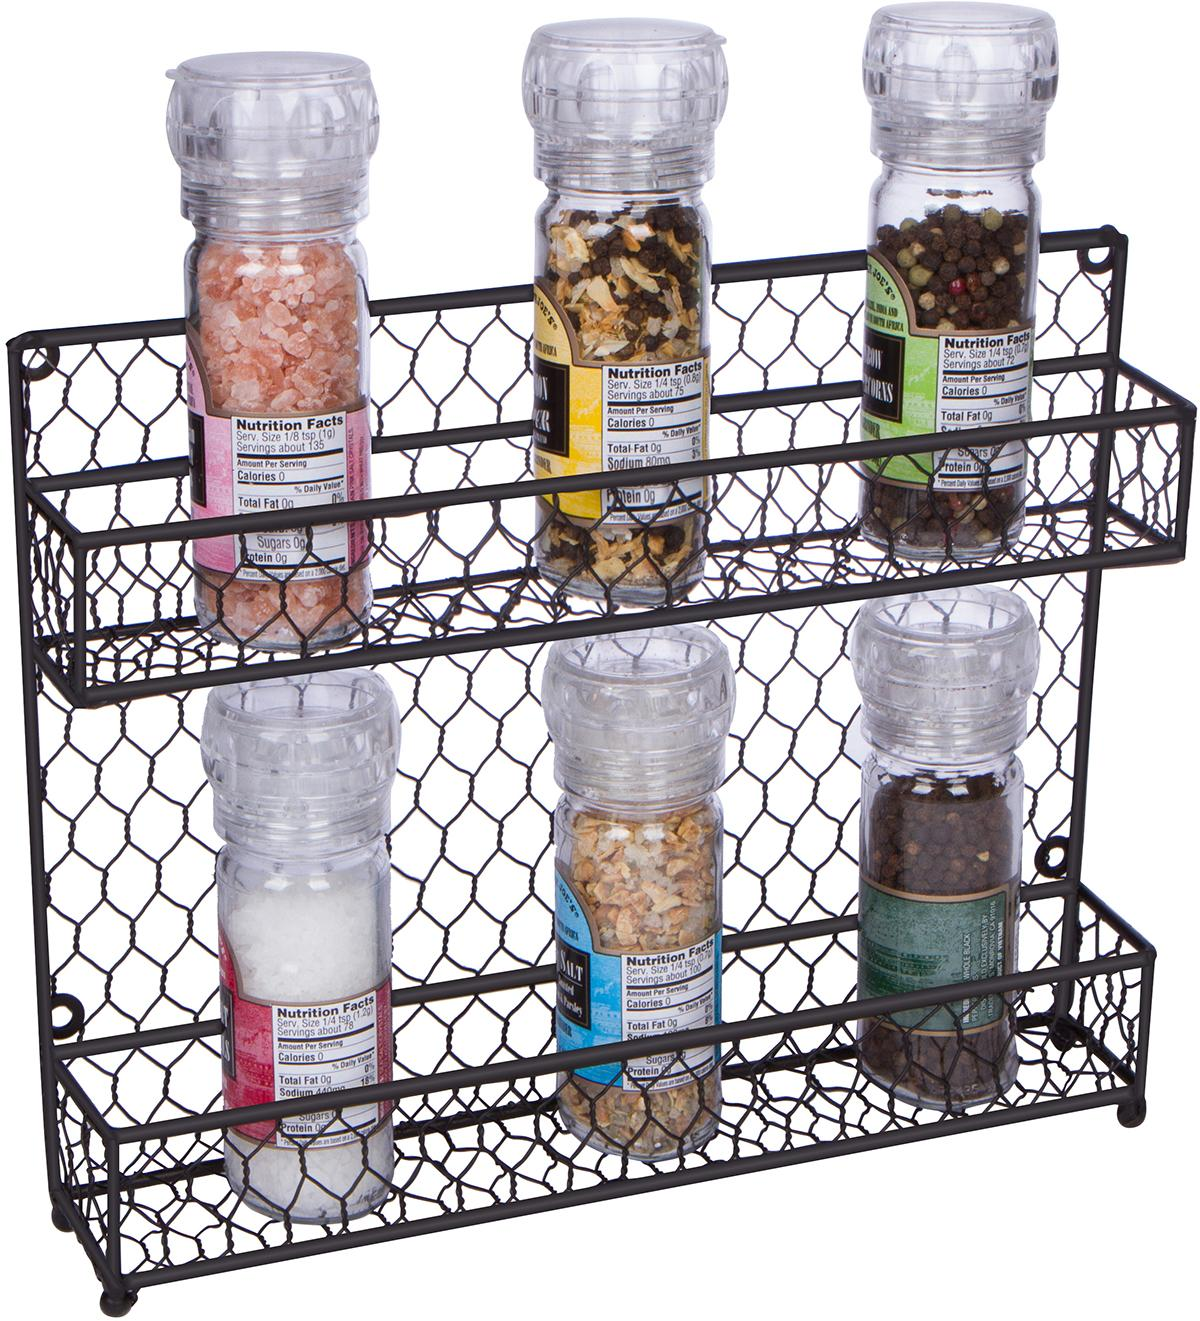 Amazon.com: Trademark Innovations 2-Tier Wire Spice Rack Storage ...